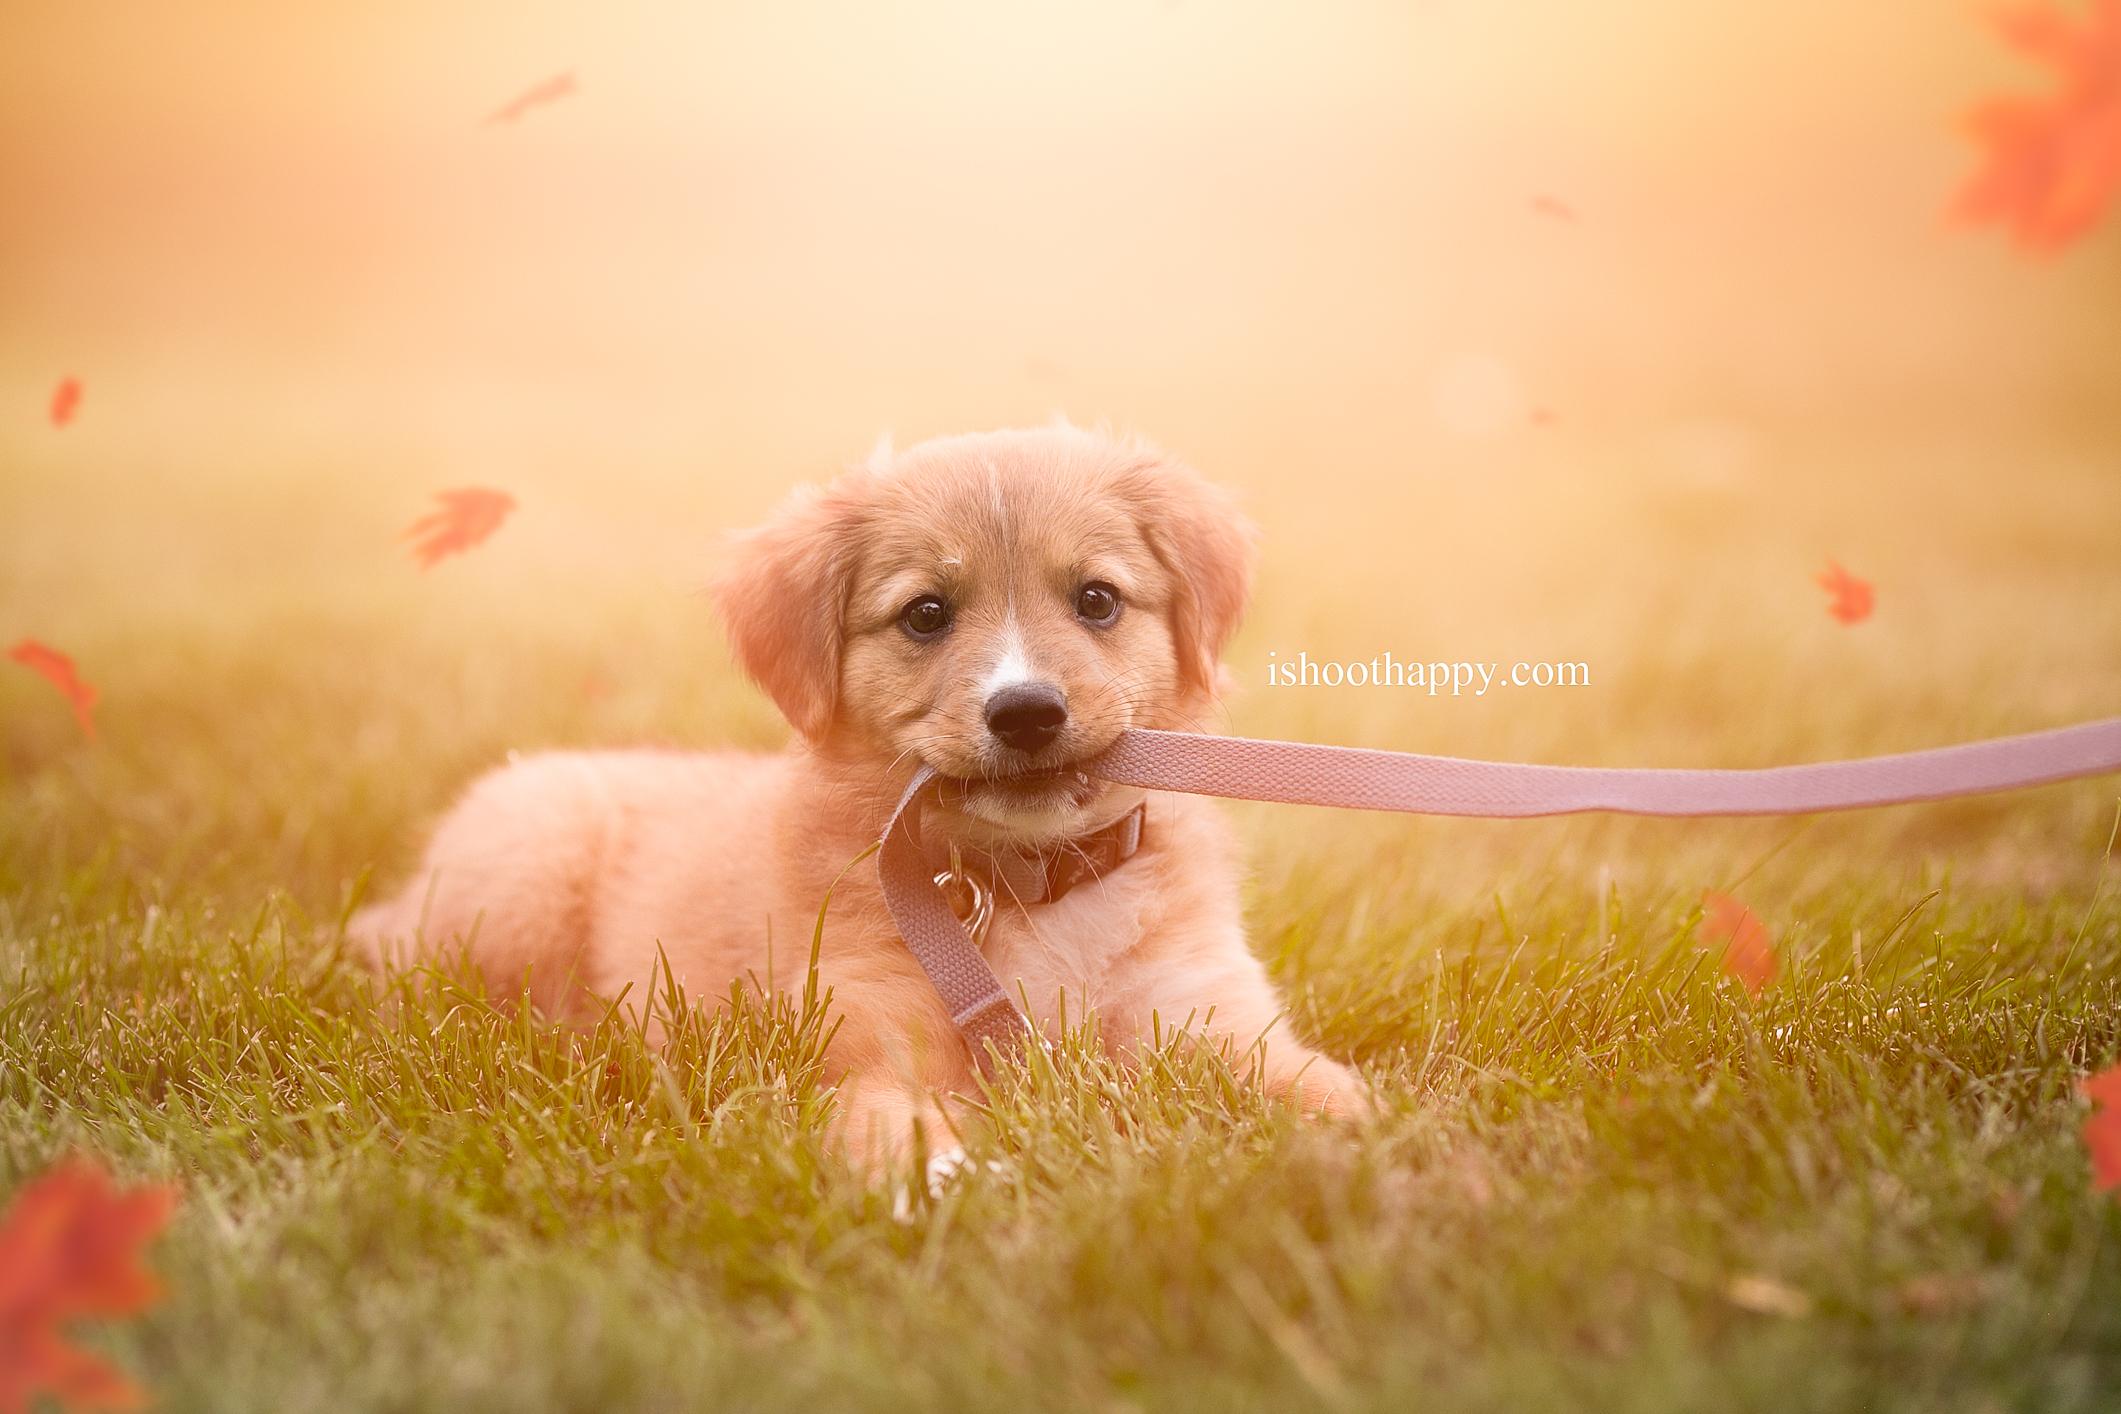 denver best pet photographer, pet photographer, puppy, pet photography, denver puppy photo, pet photographer denver, photography for pets in denver